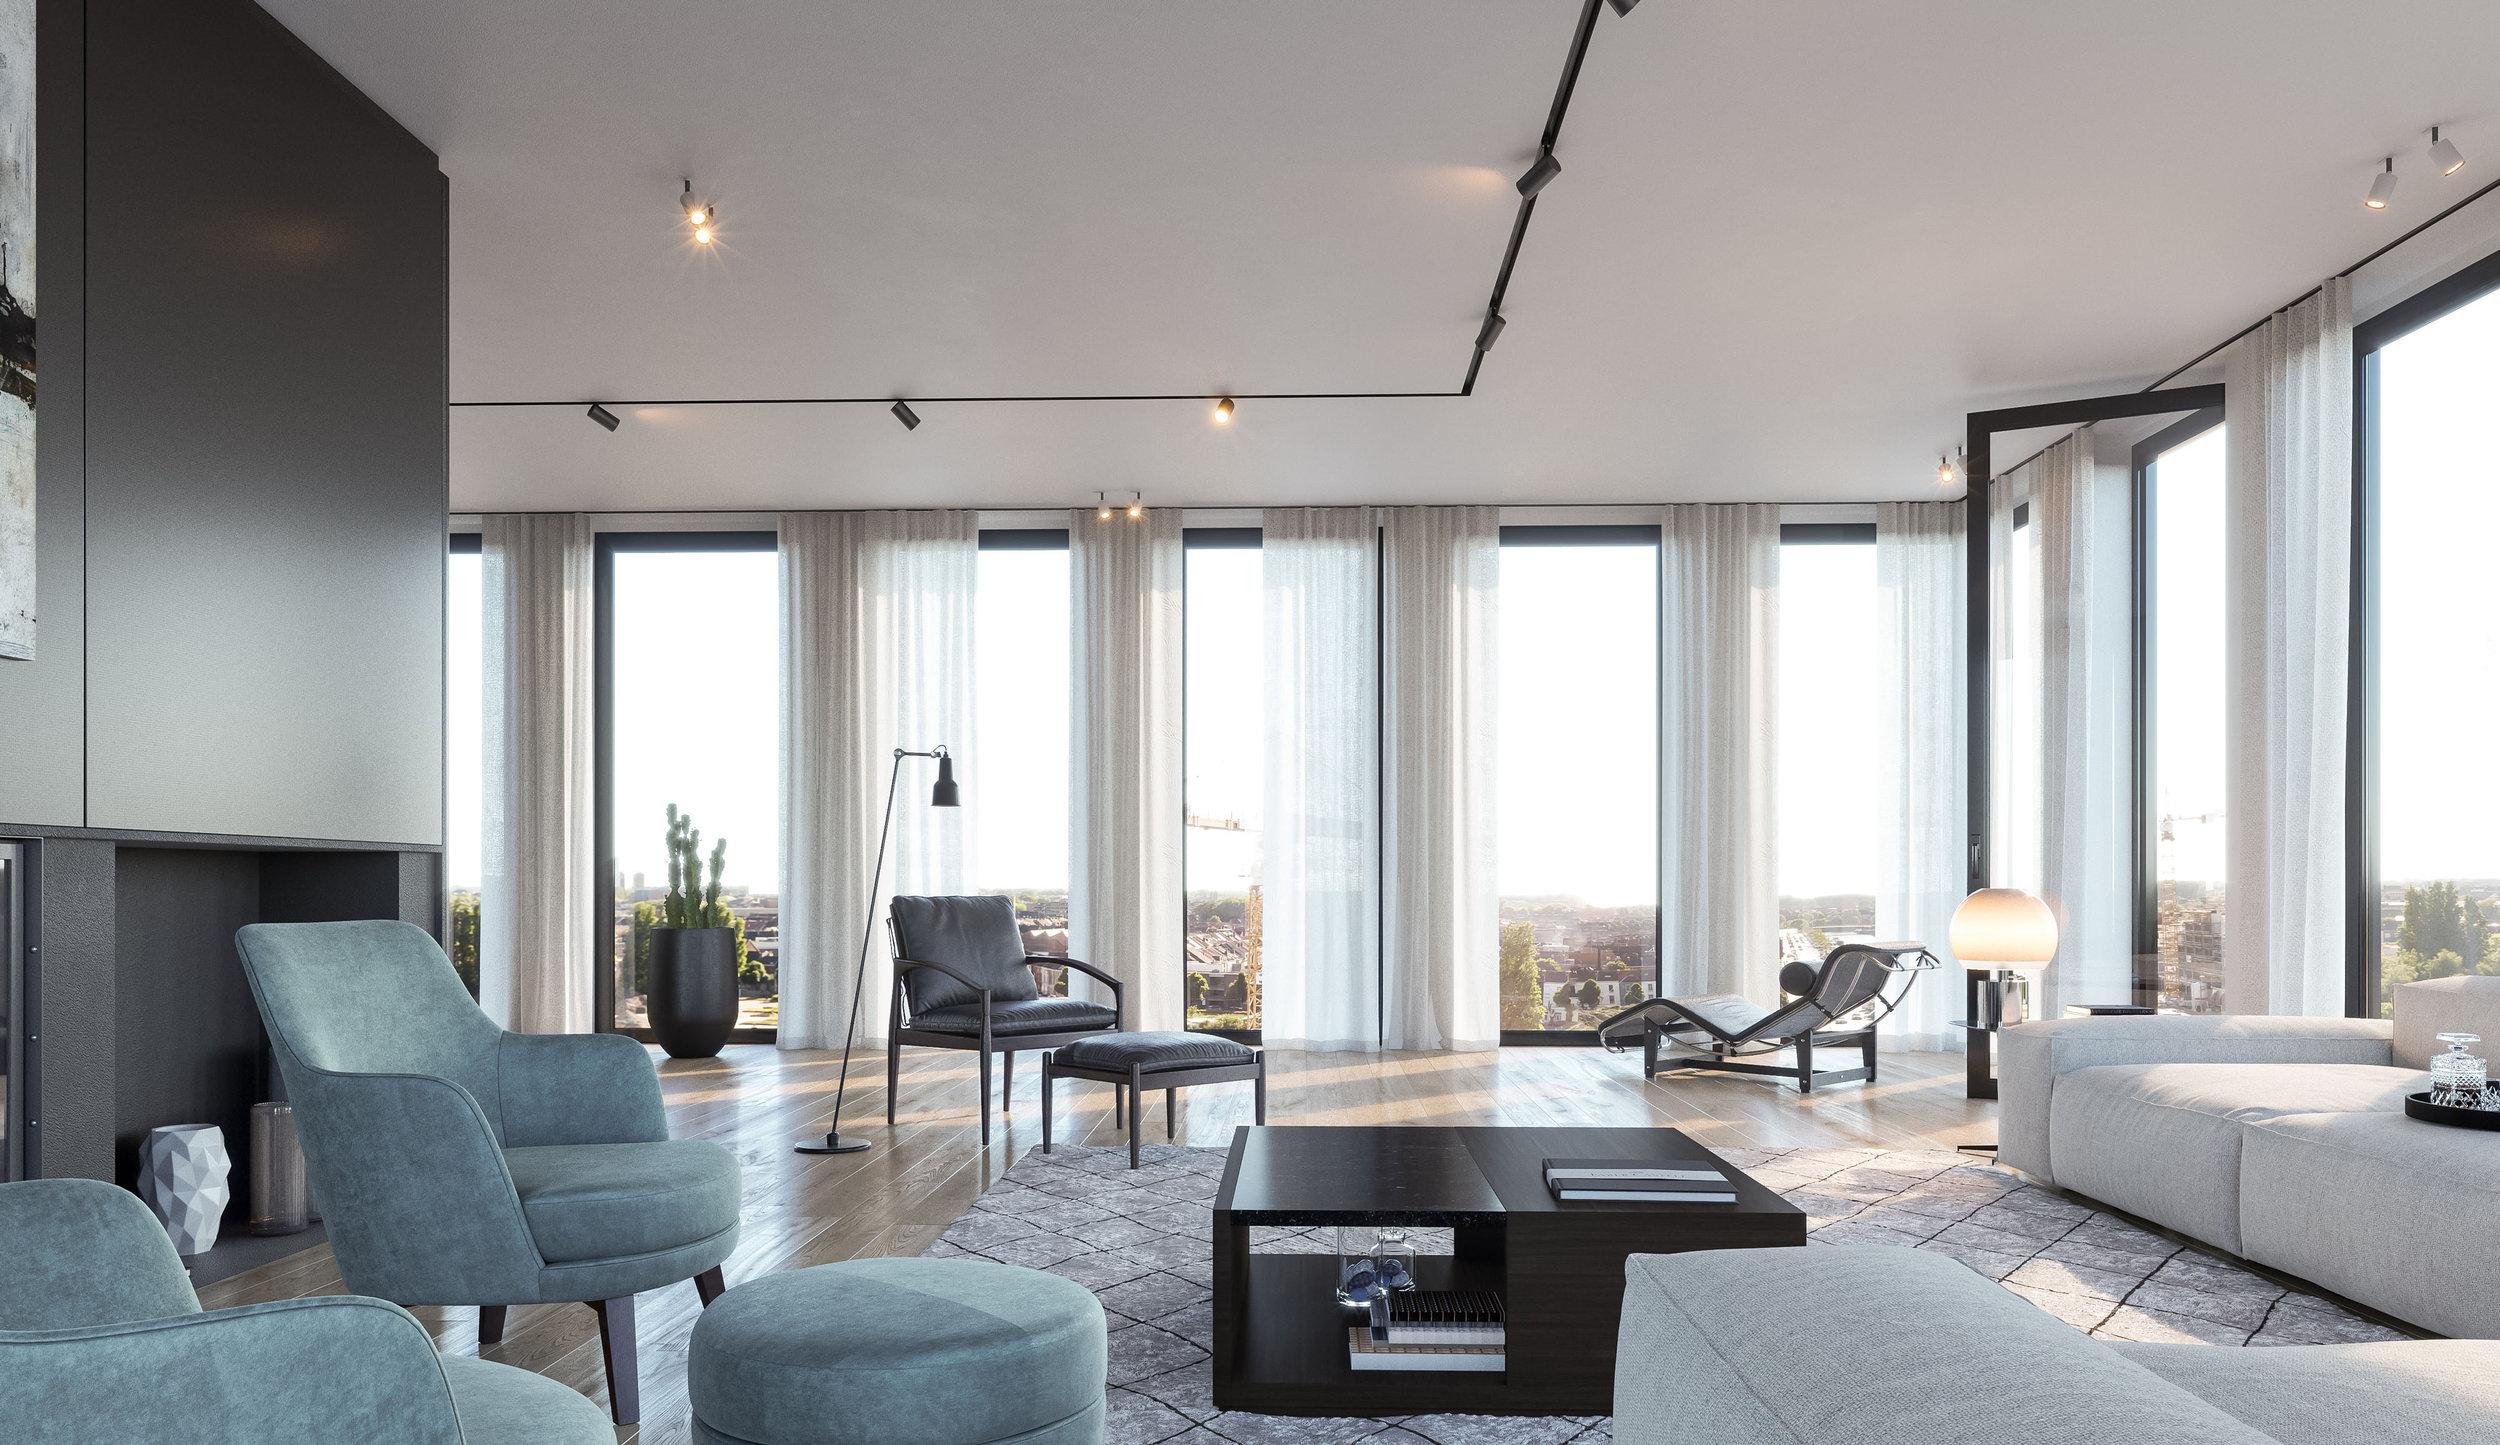 """Luxury is in each detail"" - Hubert de Givenchy ."